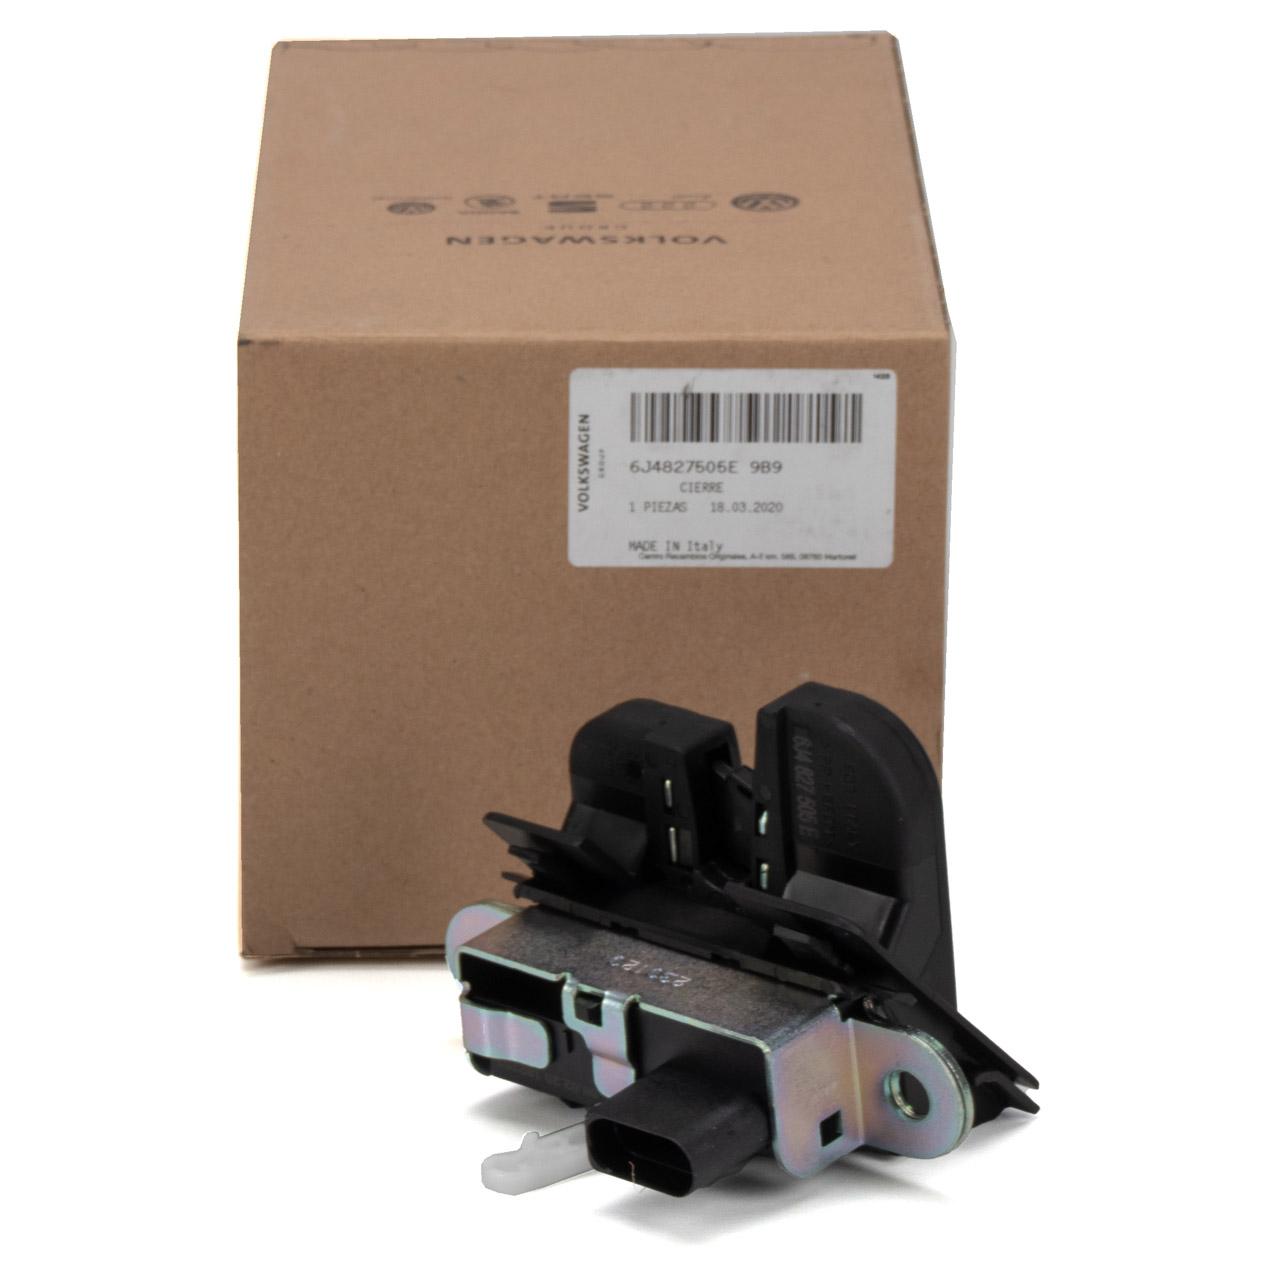 ORIGINAL SEAT Heckklappengriff Ibiza 4 (6J5, 6P1) PR-K8G 5-Türer 6J4827505E9B9